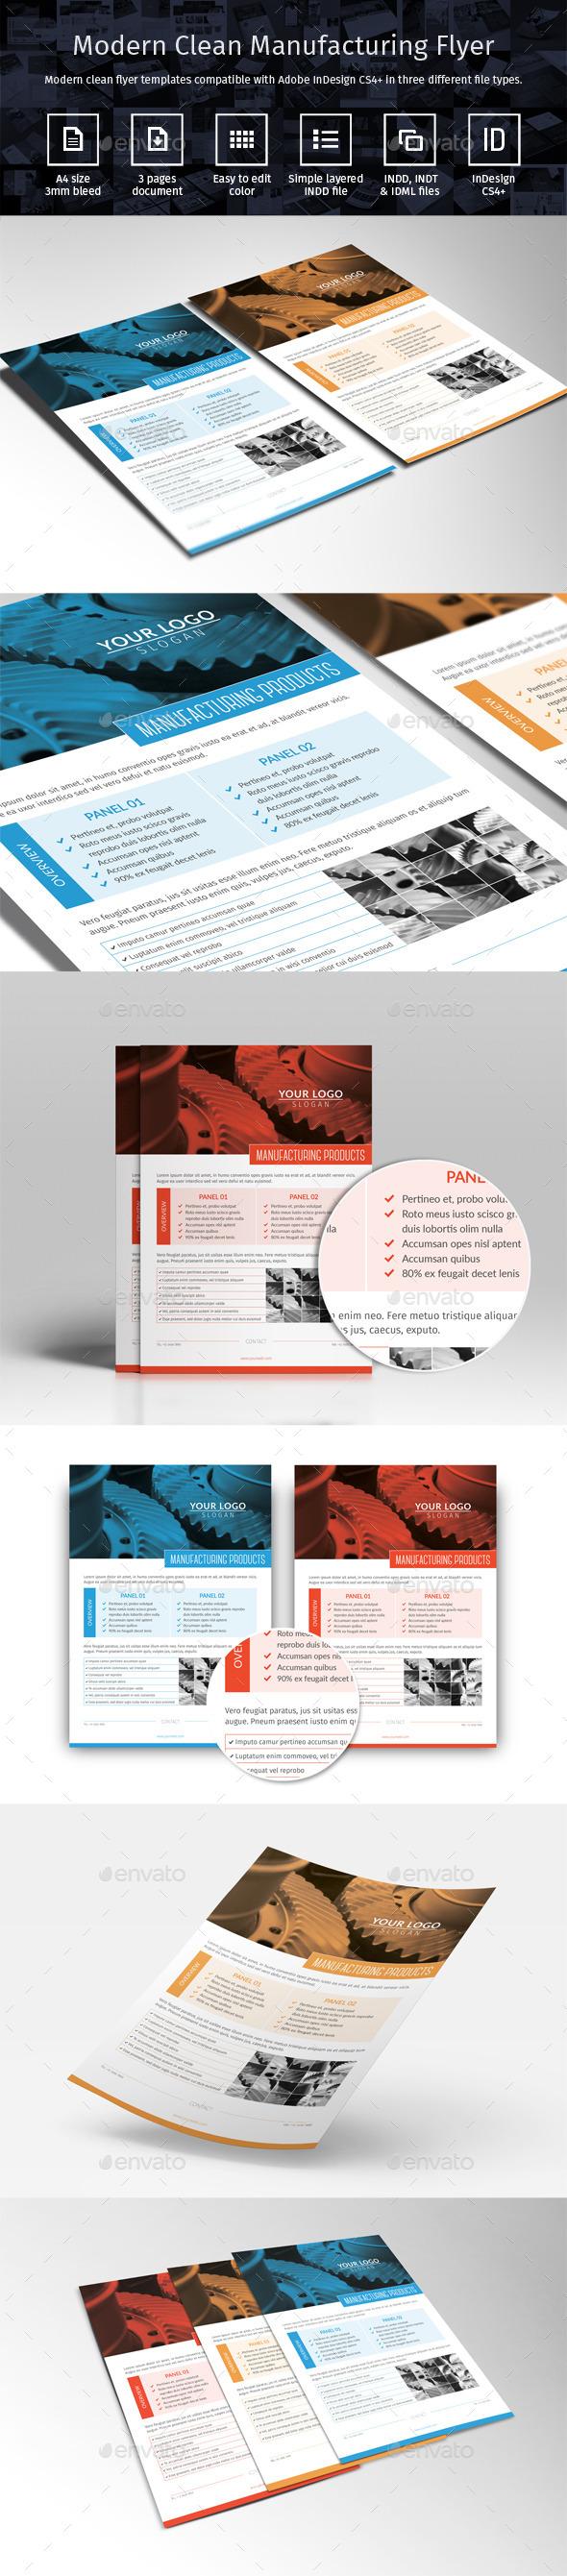 Modern Clean Manufacturing Flyer   Flyer printing, Indesign ...